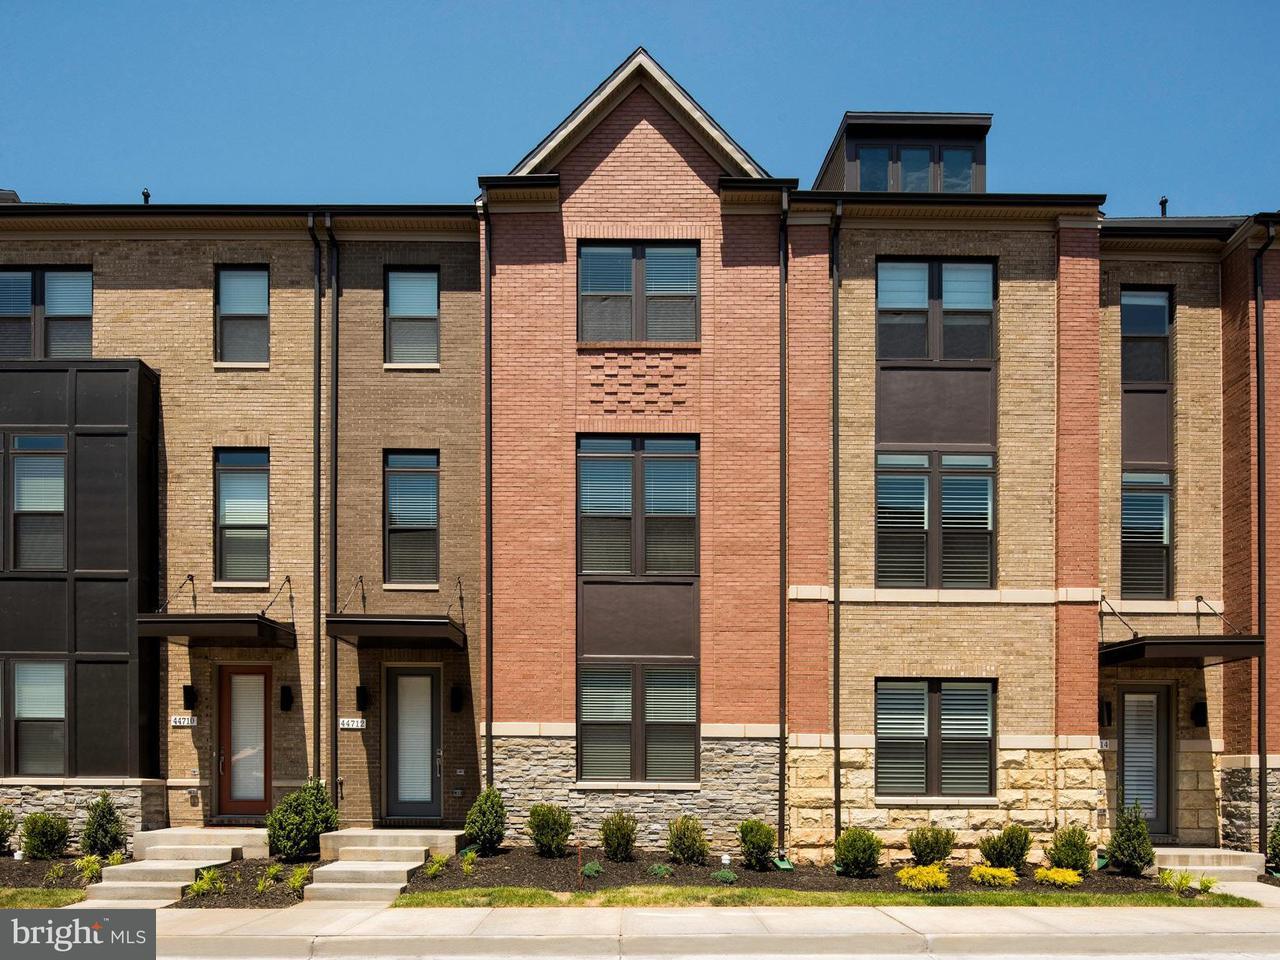 Townhouse for Sale at 44720 ELLSWORTH TER #N/A 44720 ELLSWORTH TER #N/A Ashburn, Virginia 20147 United States